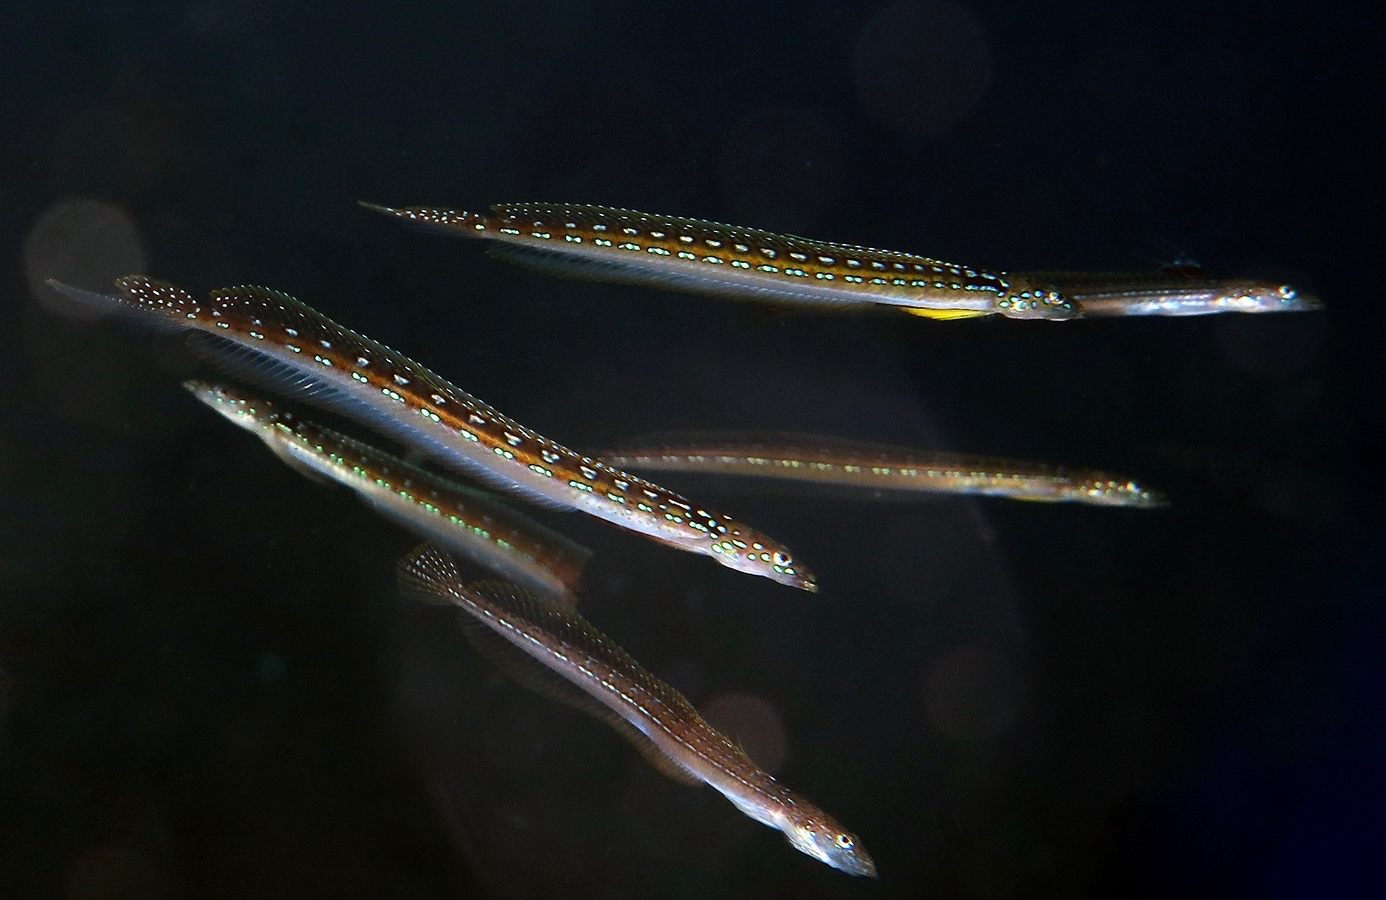 Trichonotus elegans    , 巴厘岛艾湄湾 Amed Bay 印度尼西亚 Indonesia @lazydiving.com 潜水时光